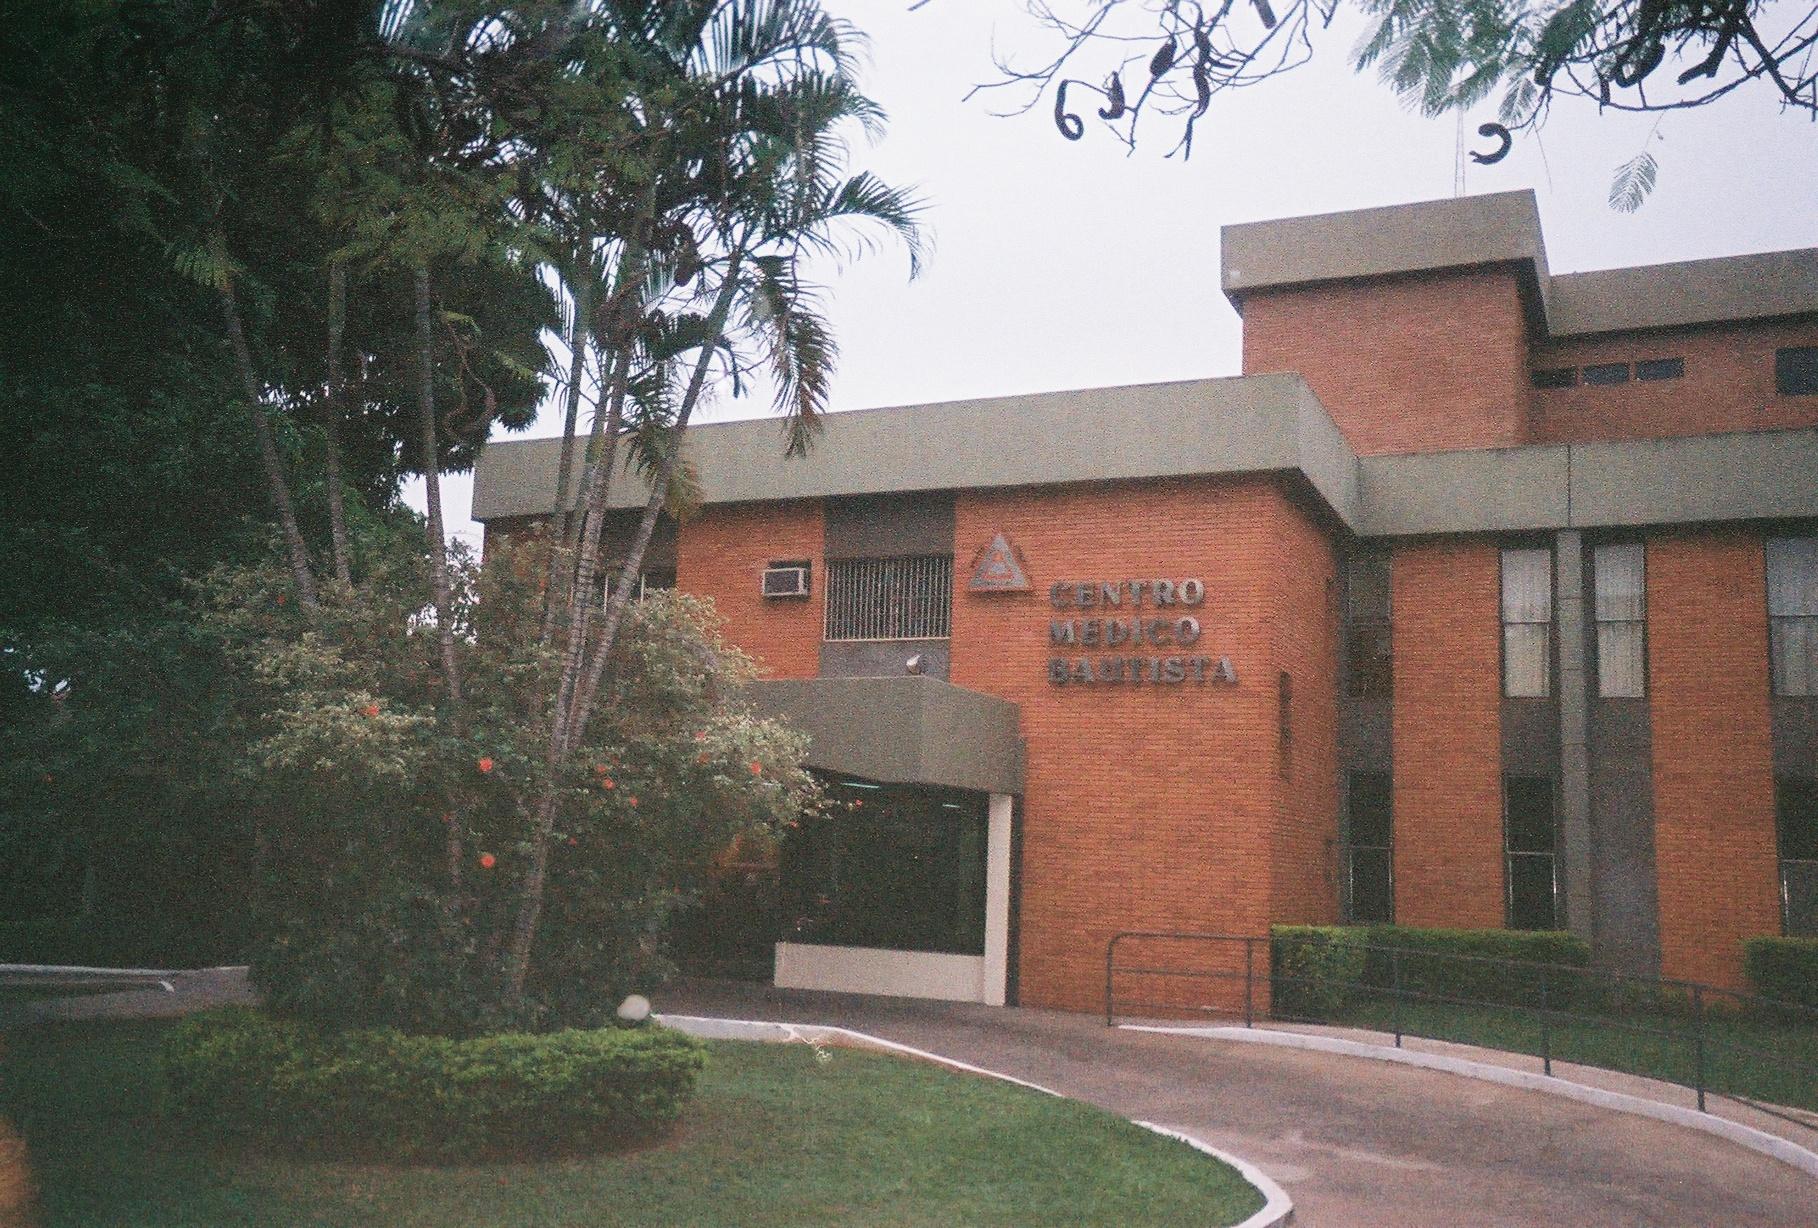 Centro Medico Bautista